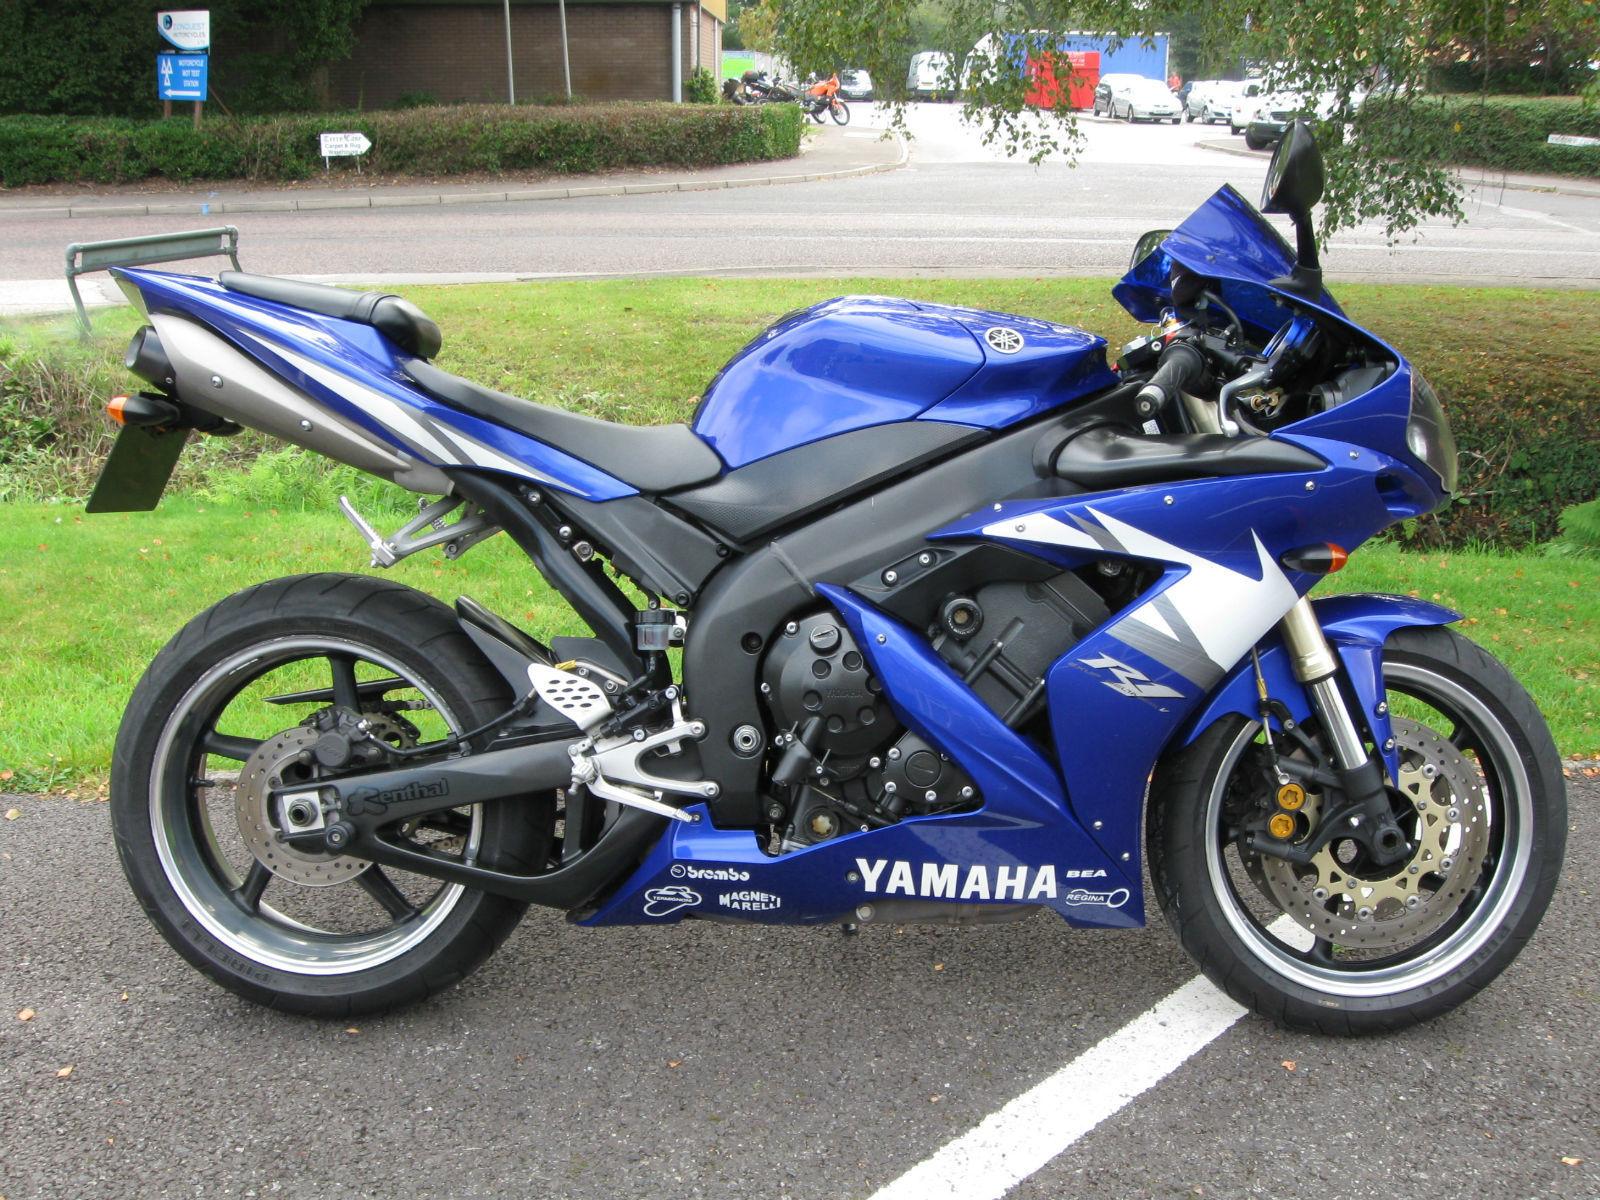 Yamaha Yzf R1 04 Blue Very Clean Braided Hoses Polished